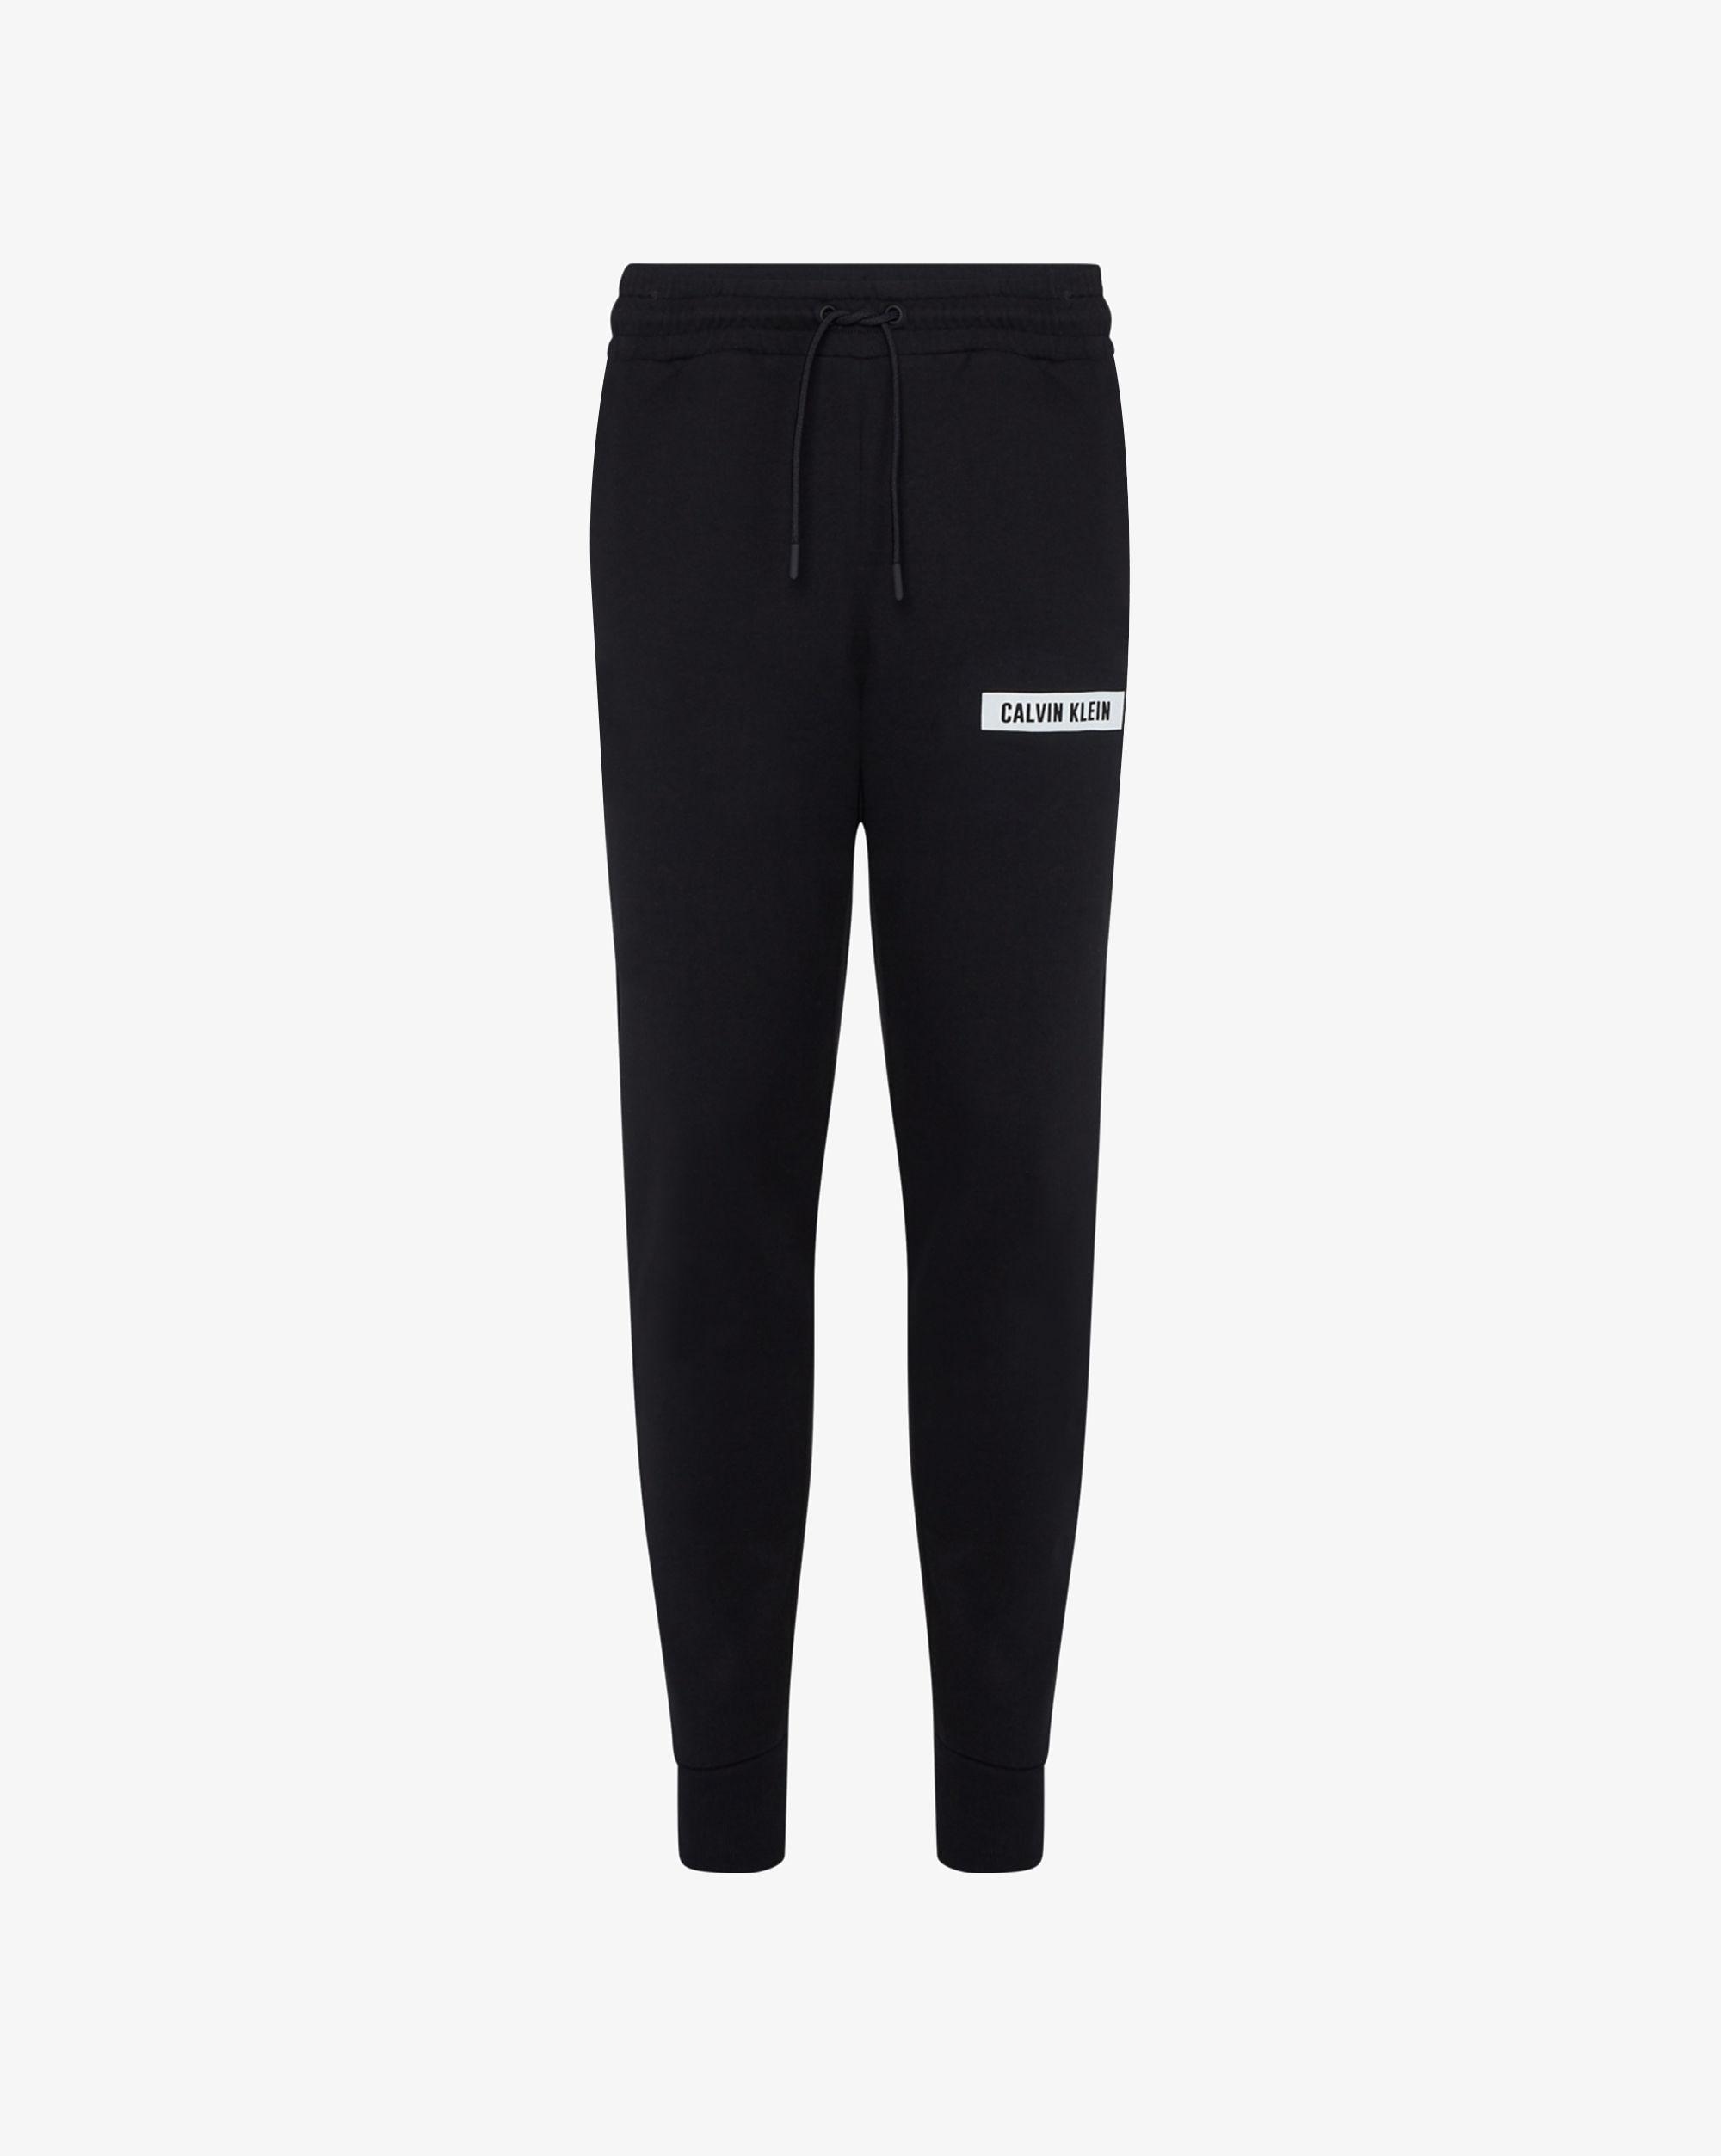 Calvin Klein Pantaloni Knit Uomo